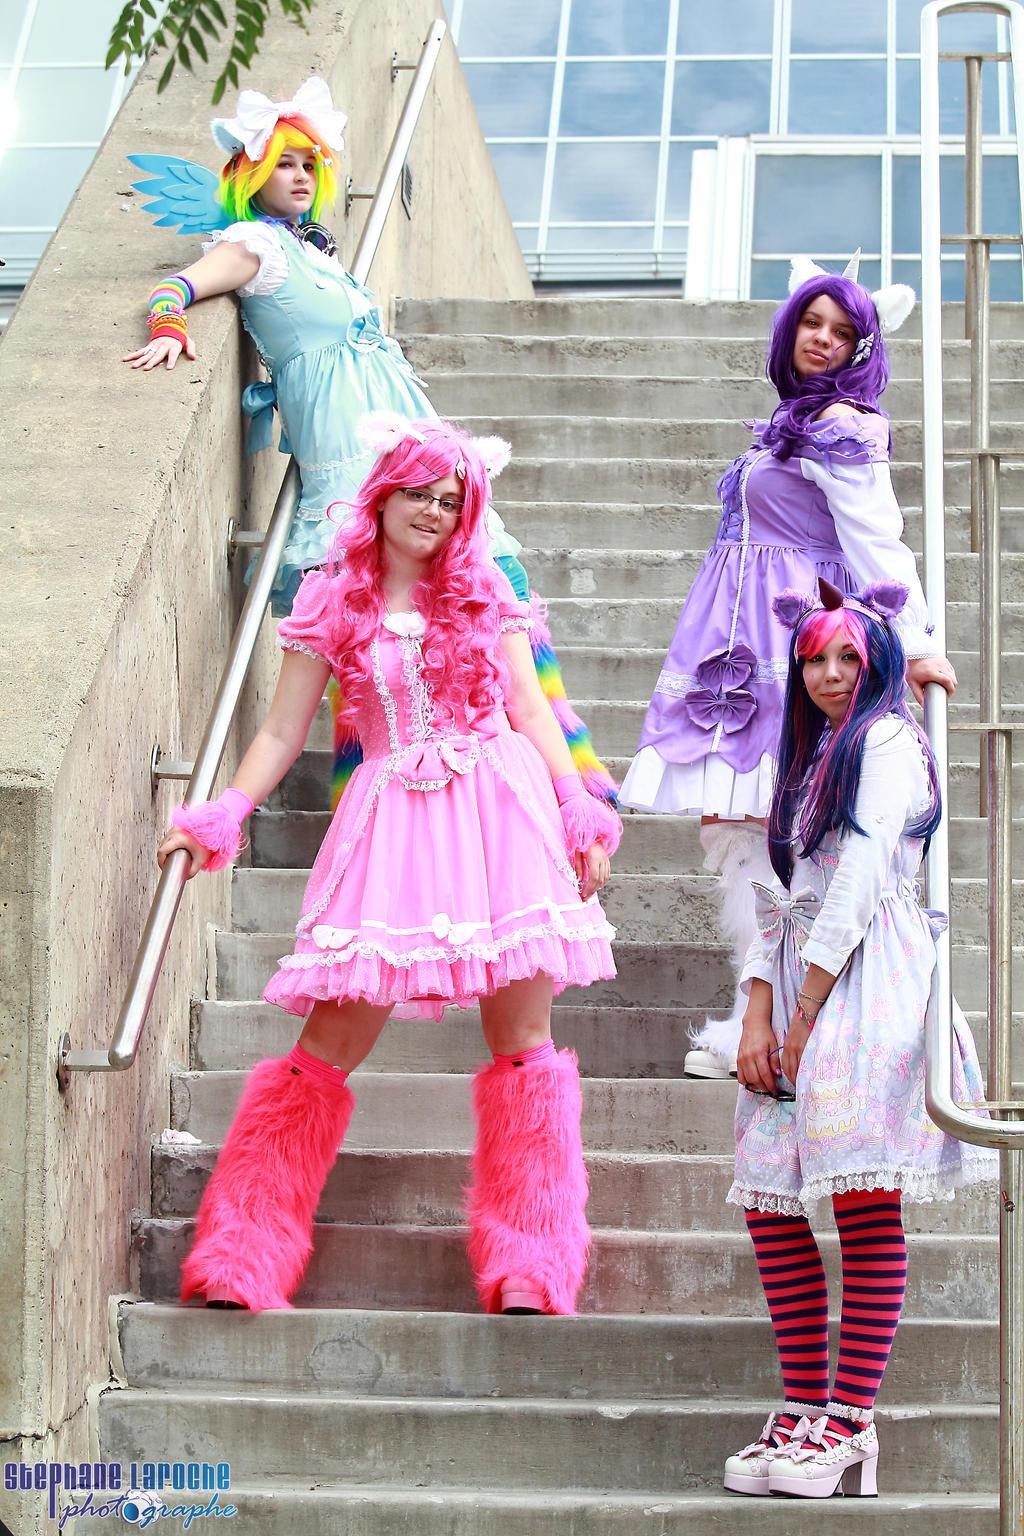 Lolita My Little Pony 01 by KyuProduction